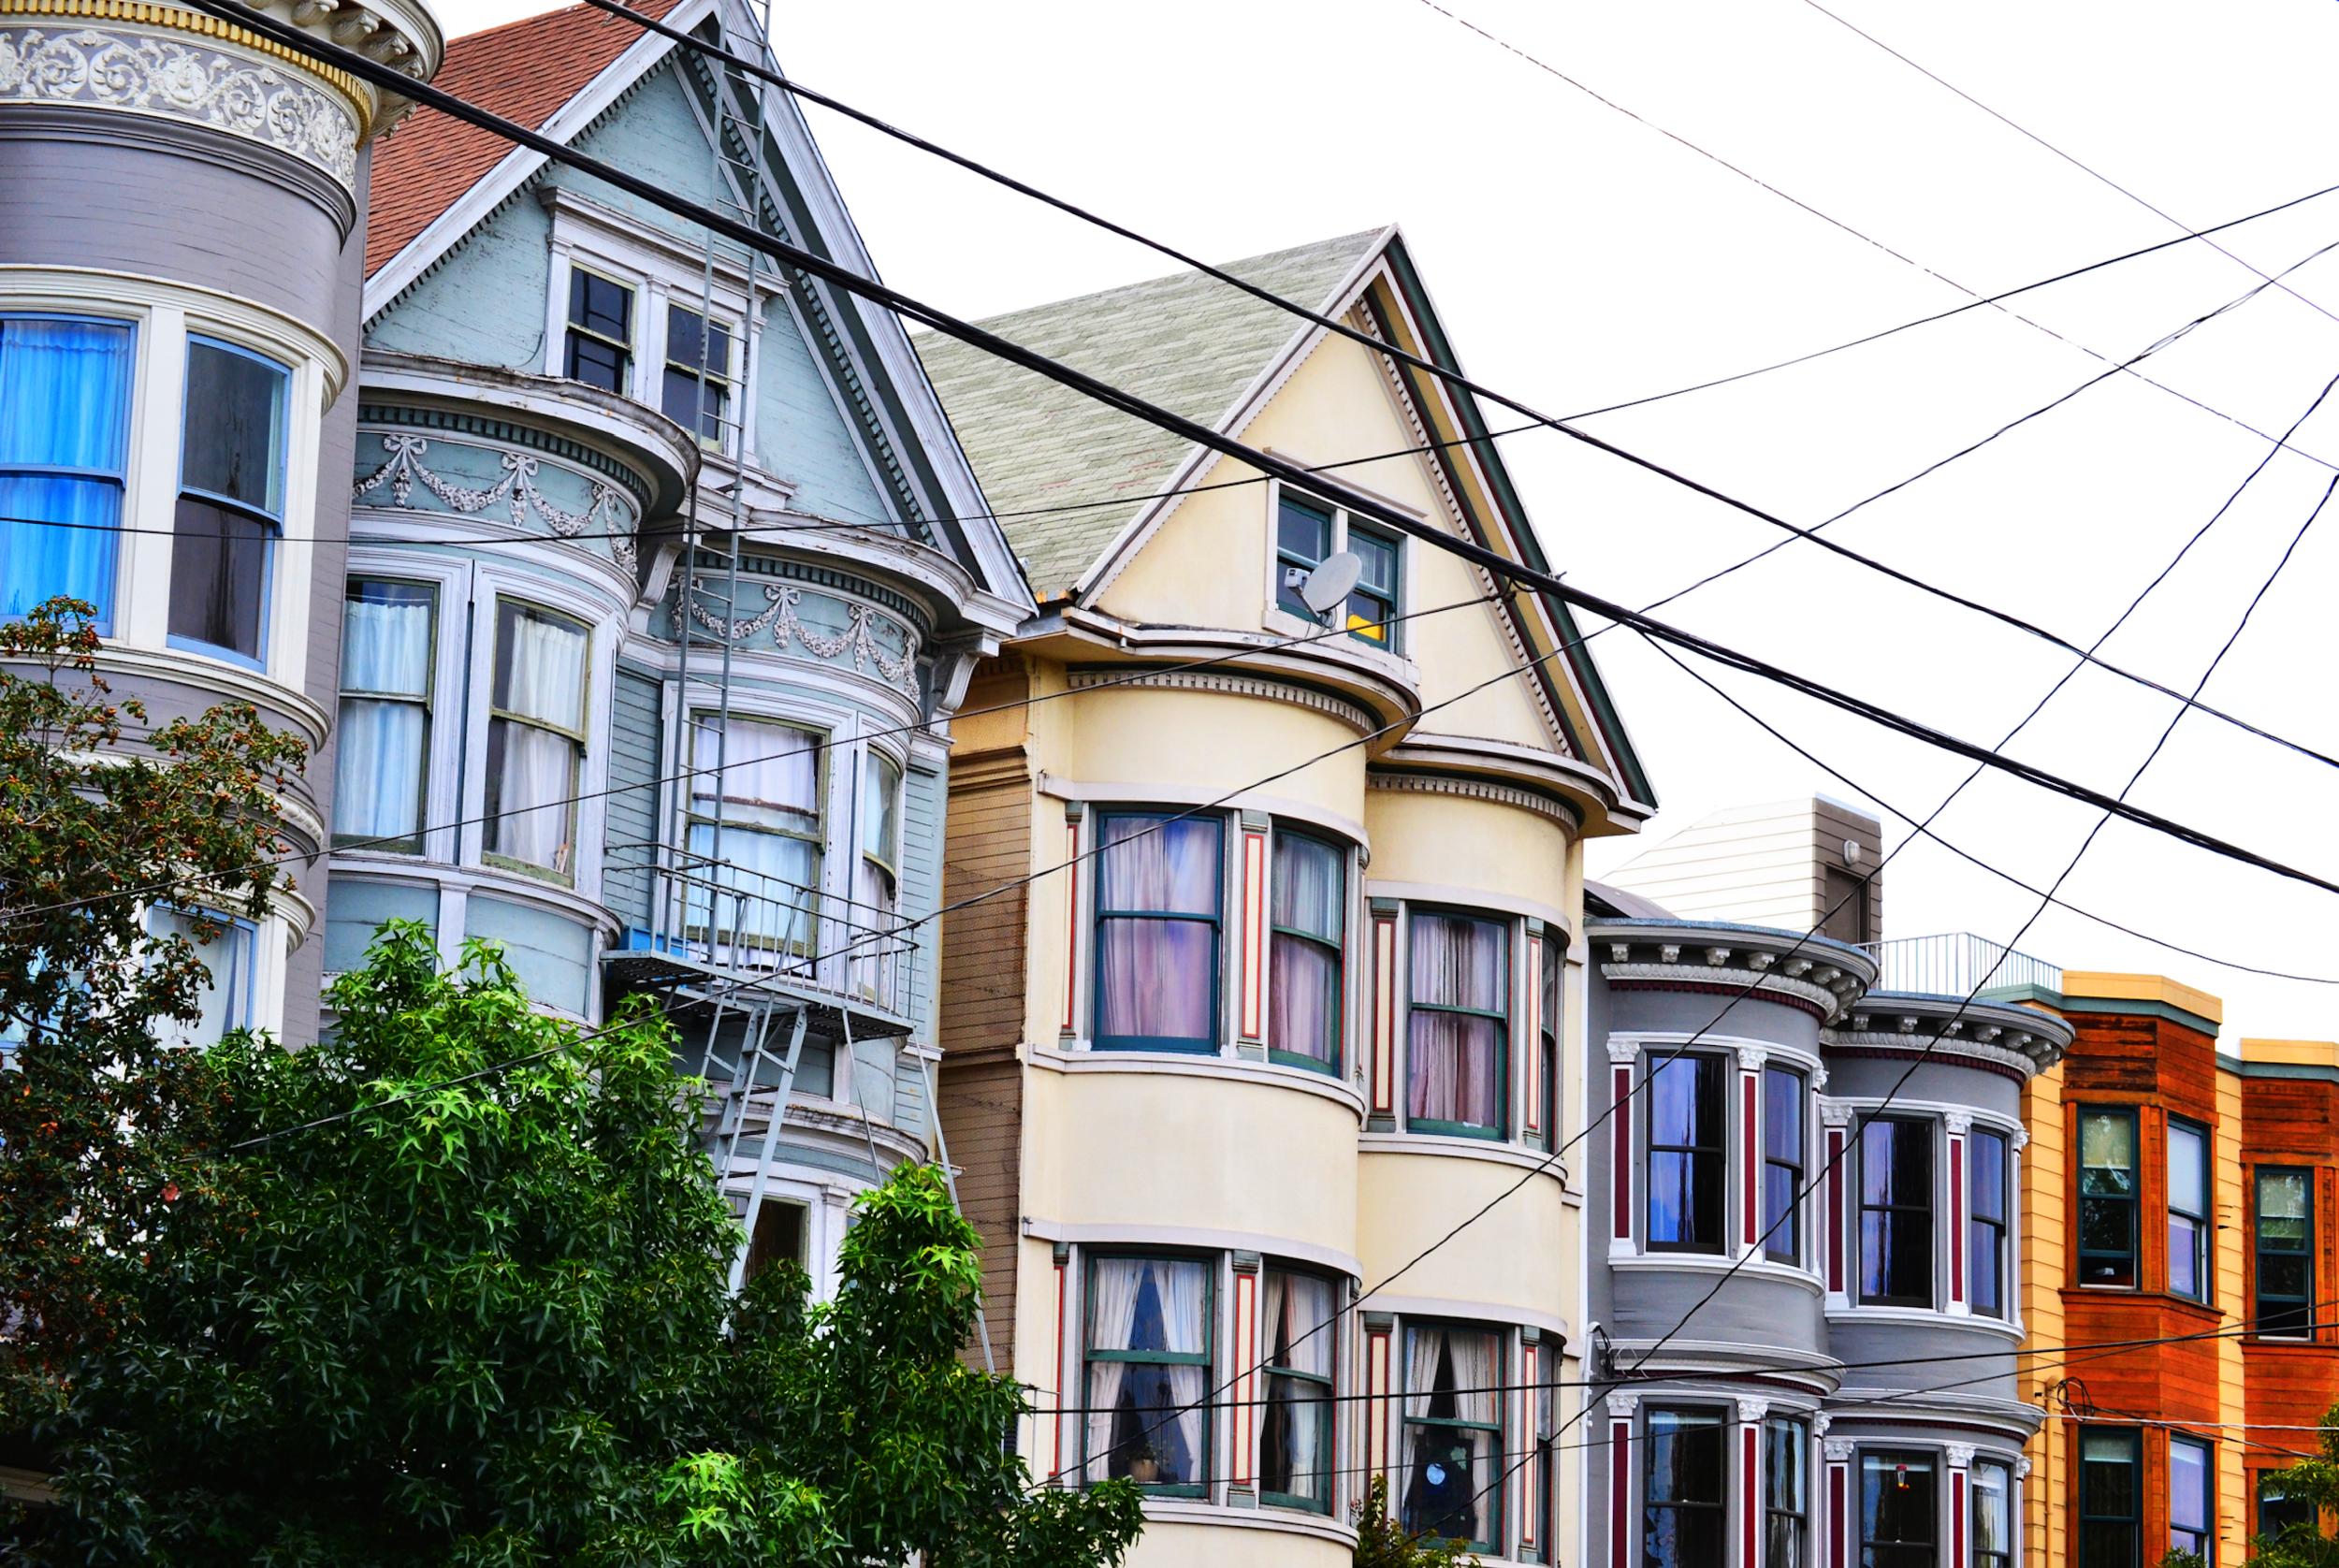 Aliana Grace Bailey San Francisco California Houses 4.png